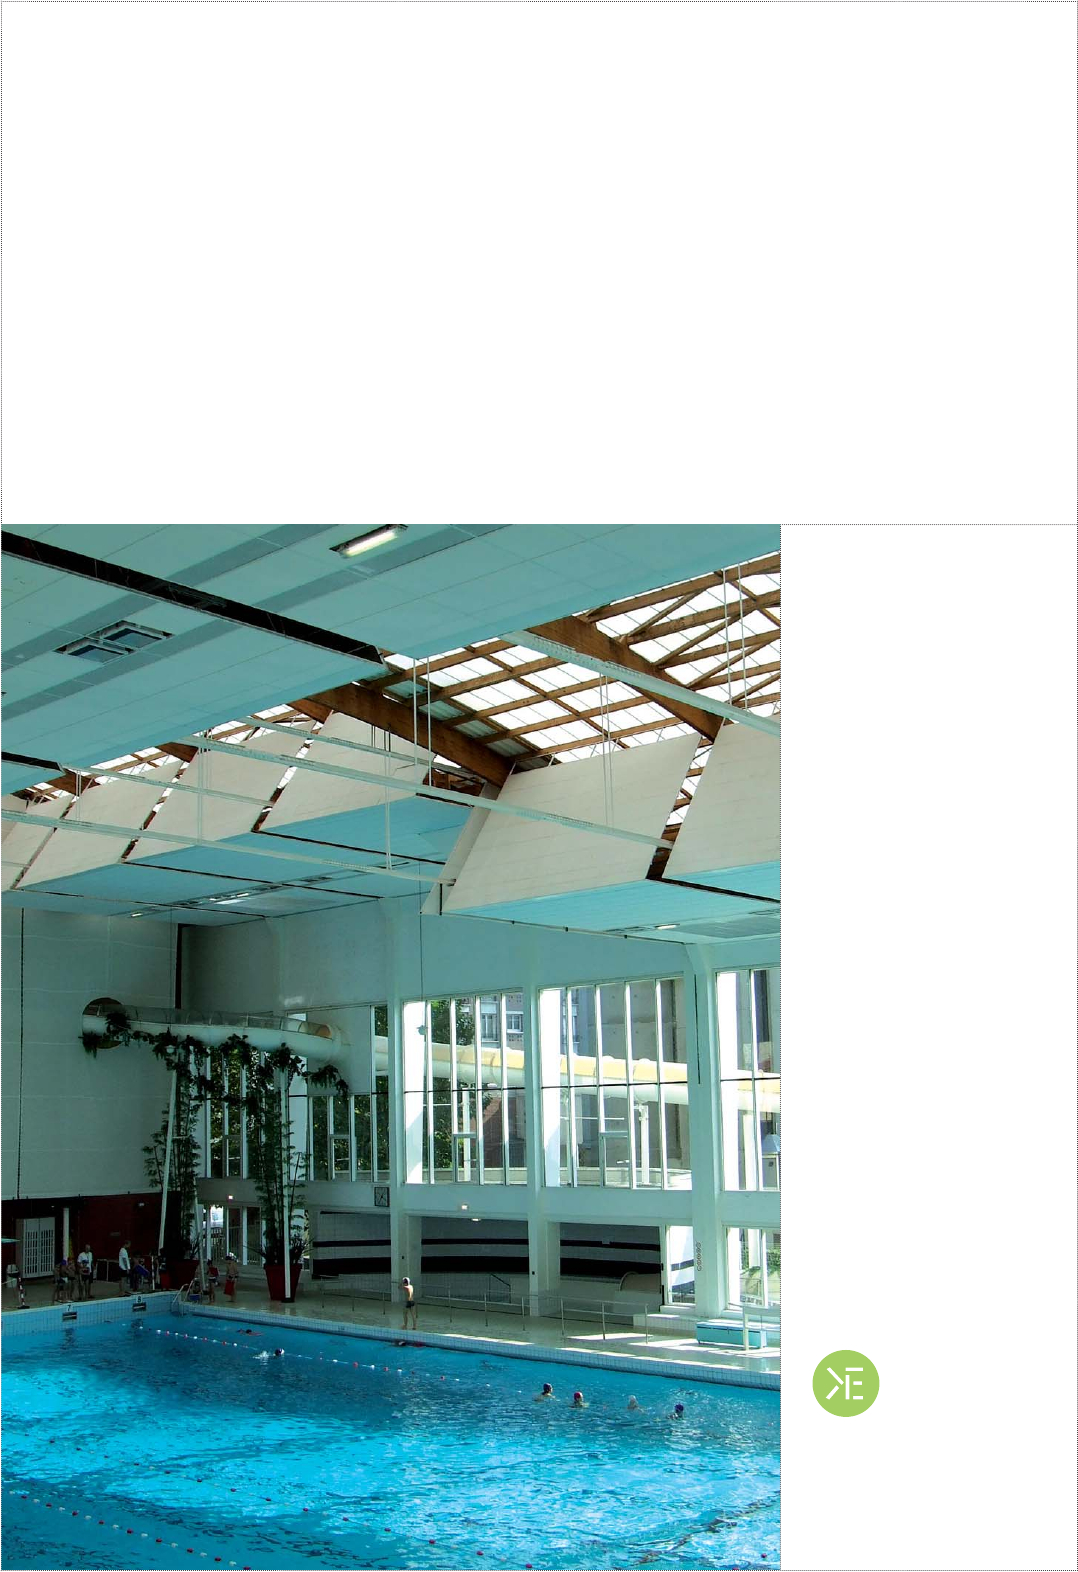 Piscine Exemple - [Pdf Document] intérieur Piscine De Mourenx